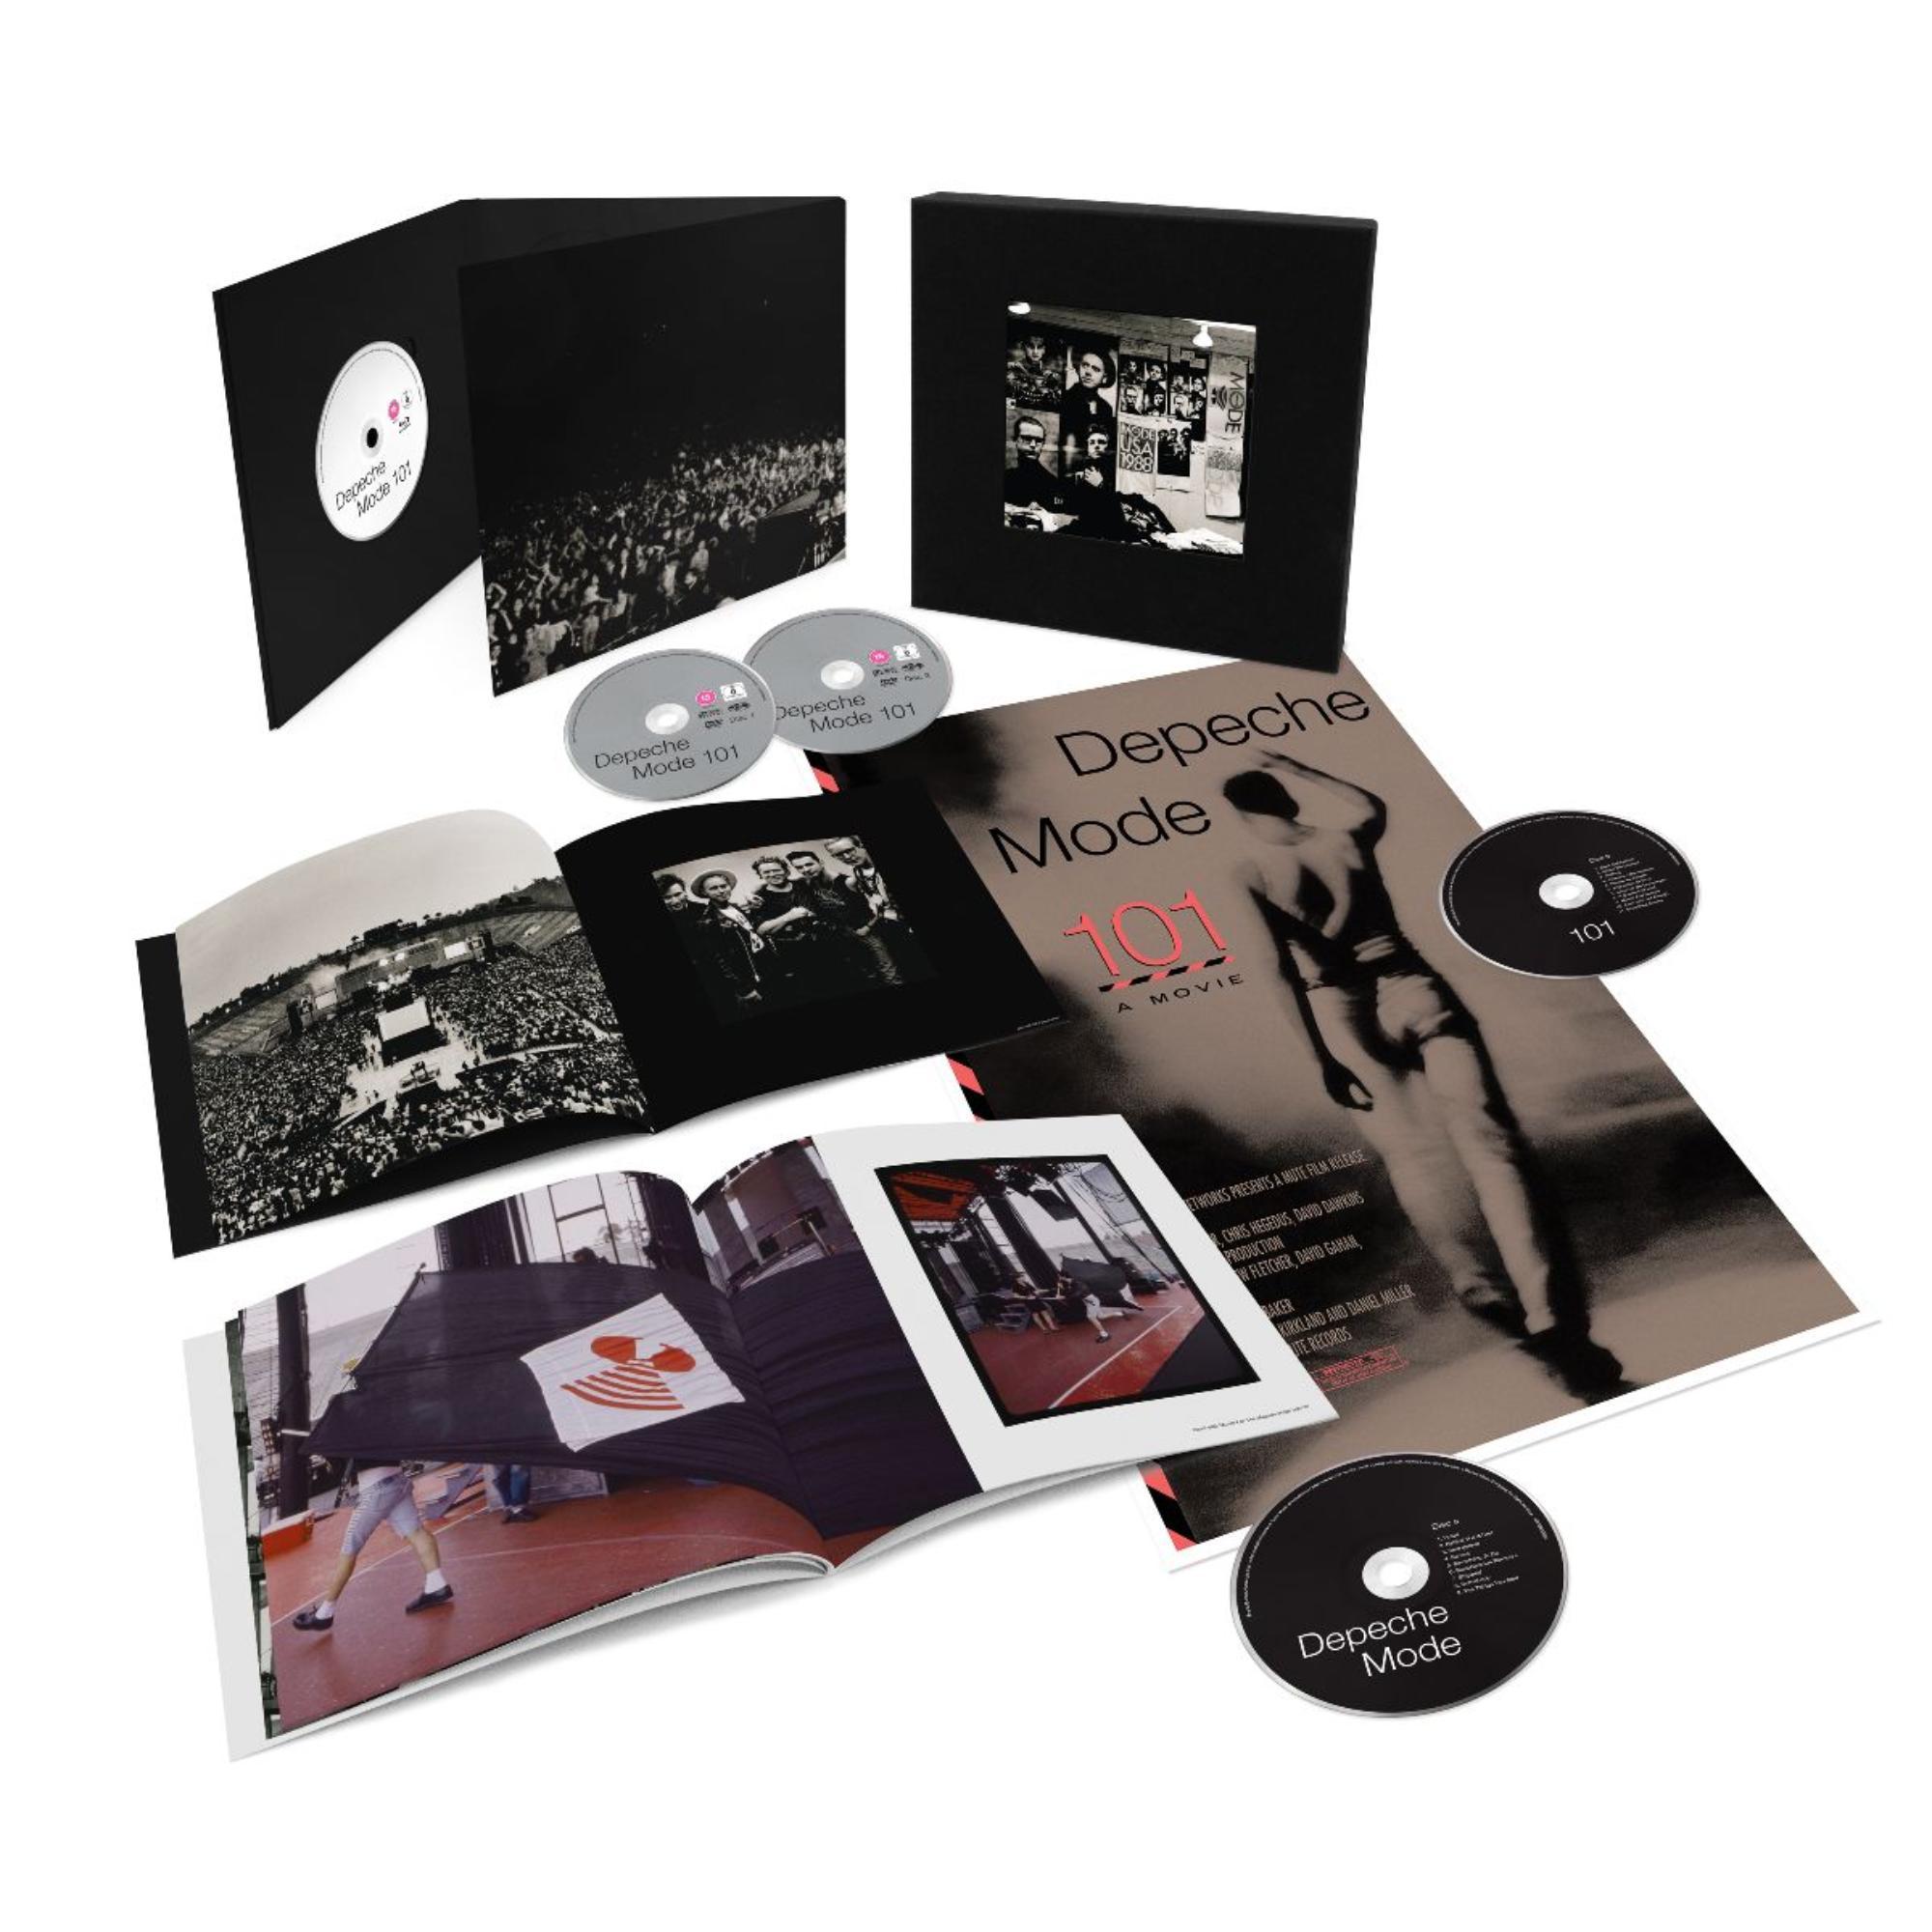 Depeche Mode 101 HD